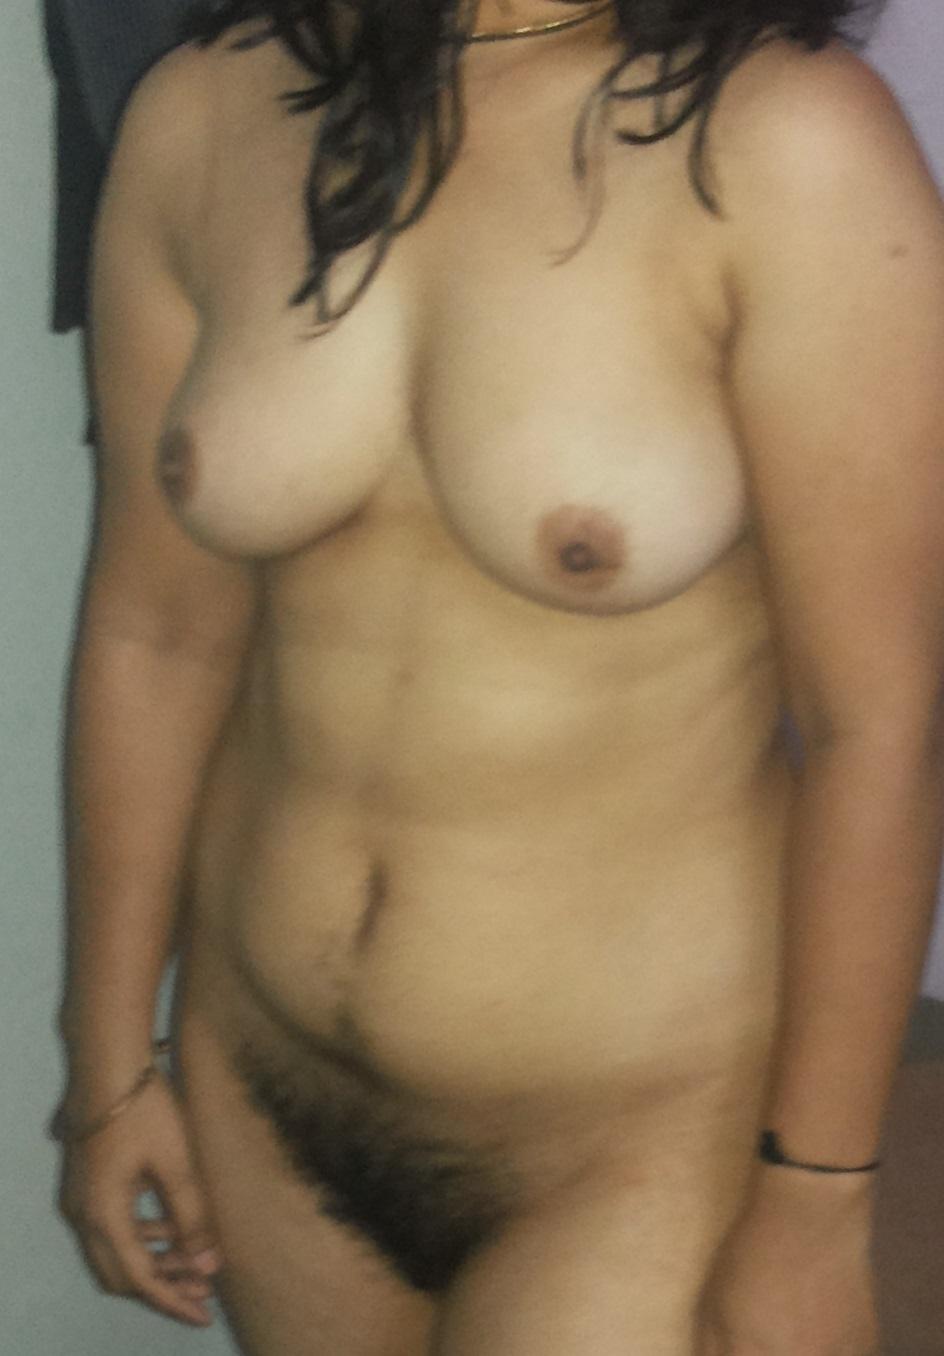 Nude granny videos